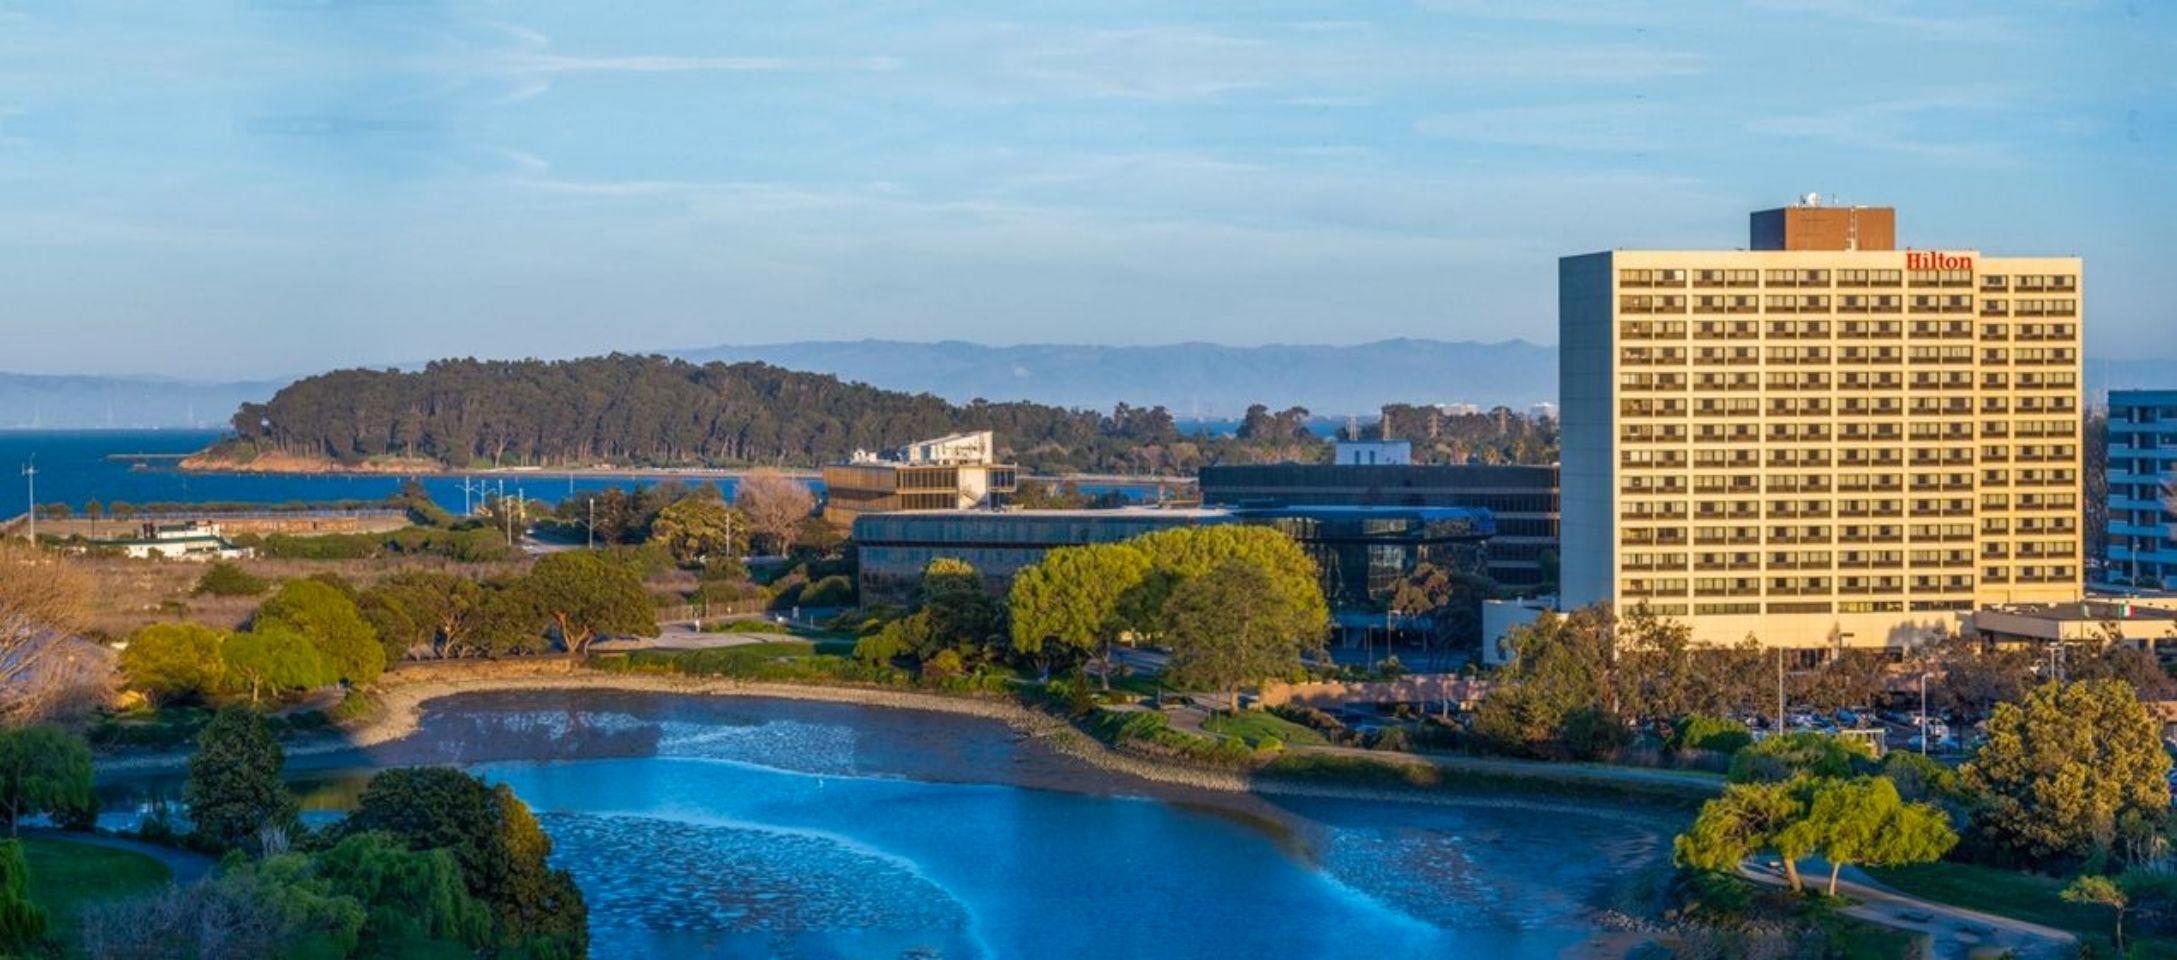 Het Hilton San Francisco Airport Bayfront ligt aan San Francisco bay